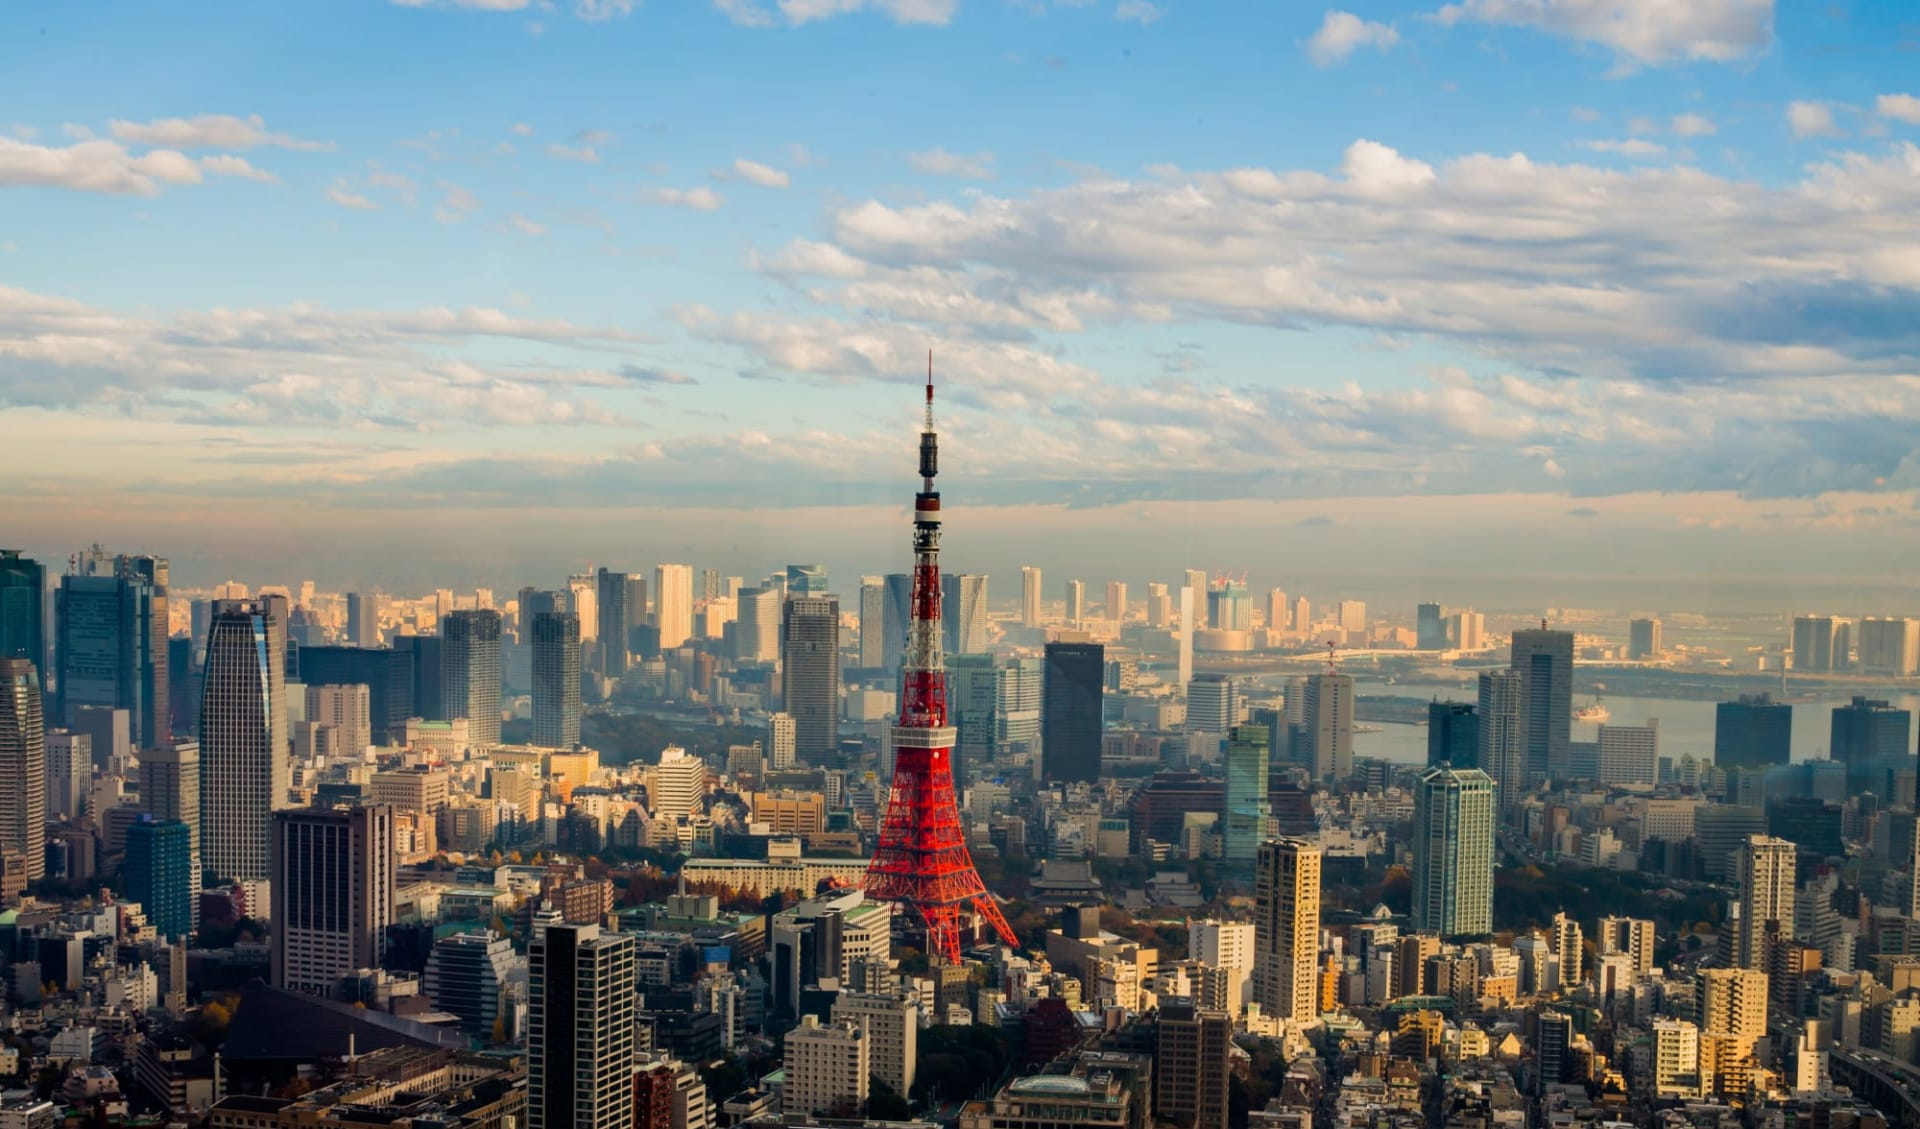 Kontrastreiches Japan ab Tokio: Tokyo: City view with Tower